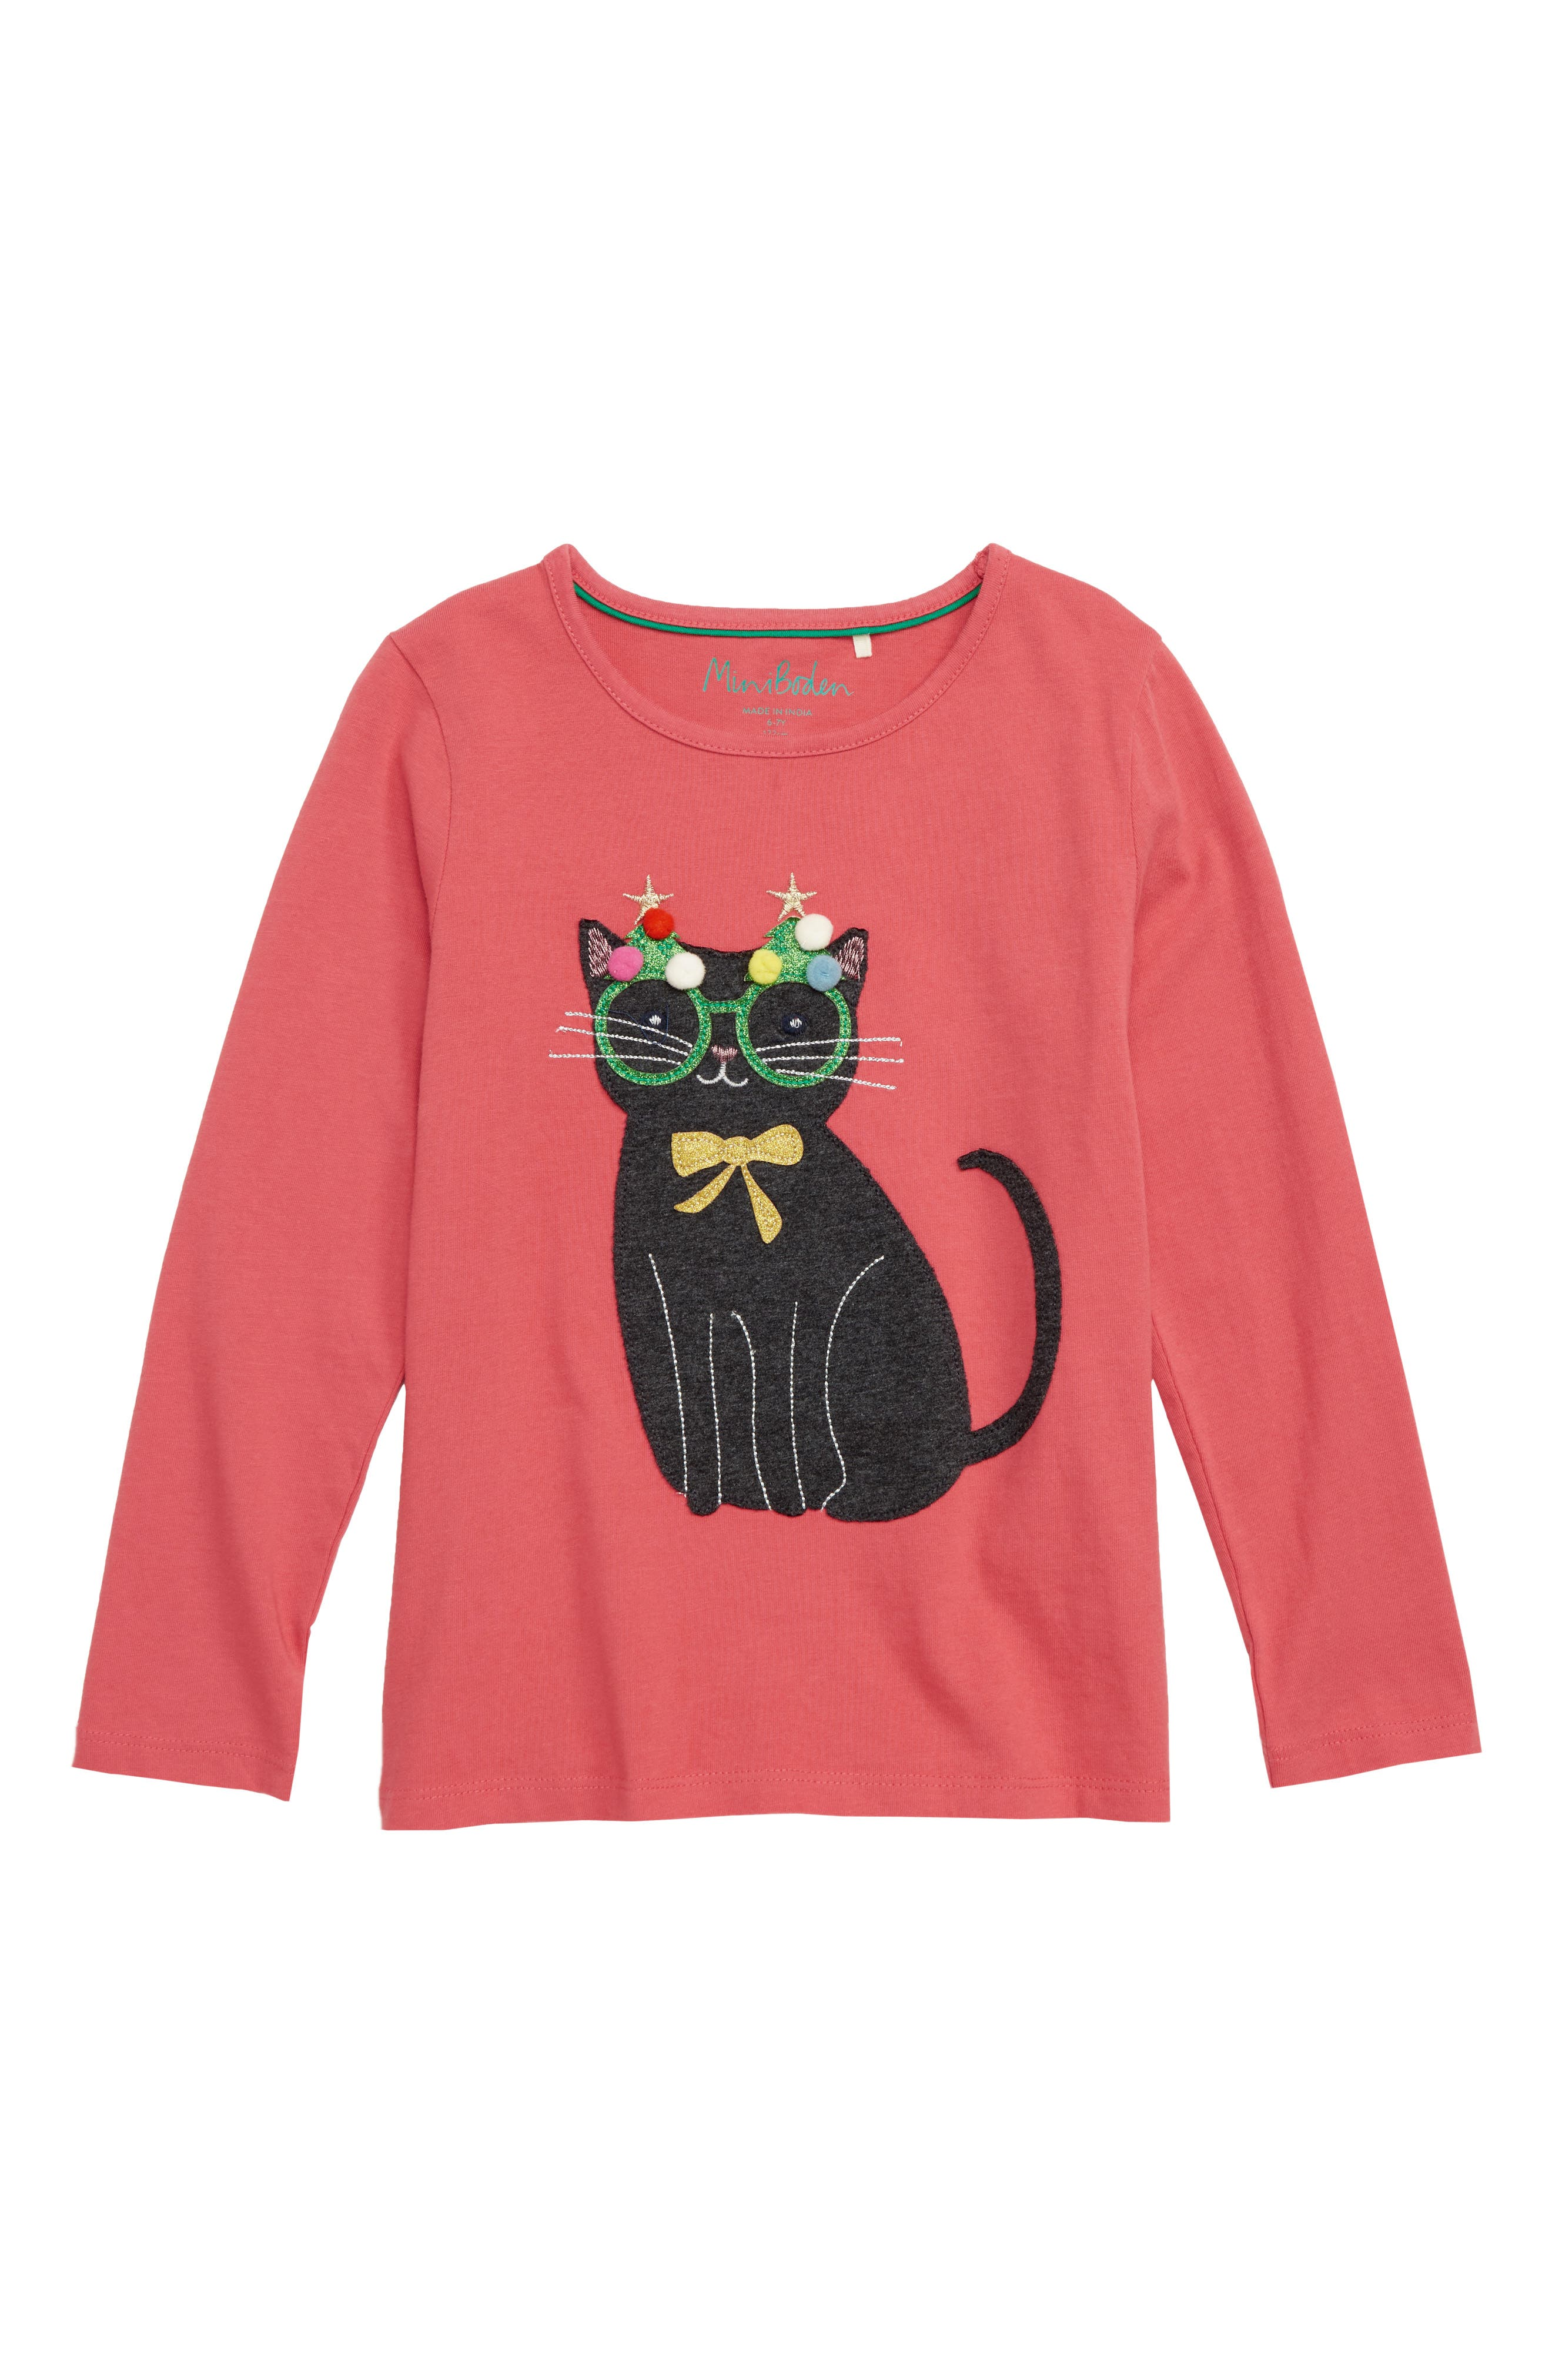 Mini Boden Festive Animals Tee,                         Main,                         color, PNK ROSETTE PINK CAT